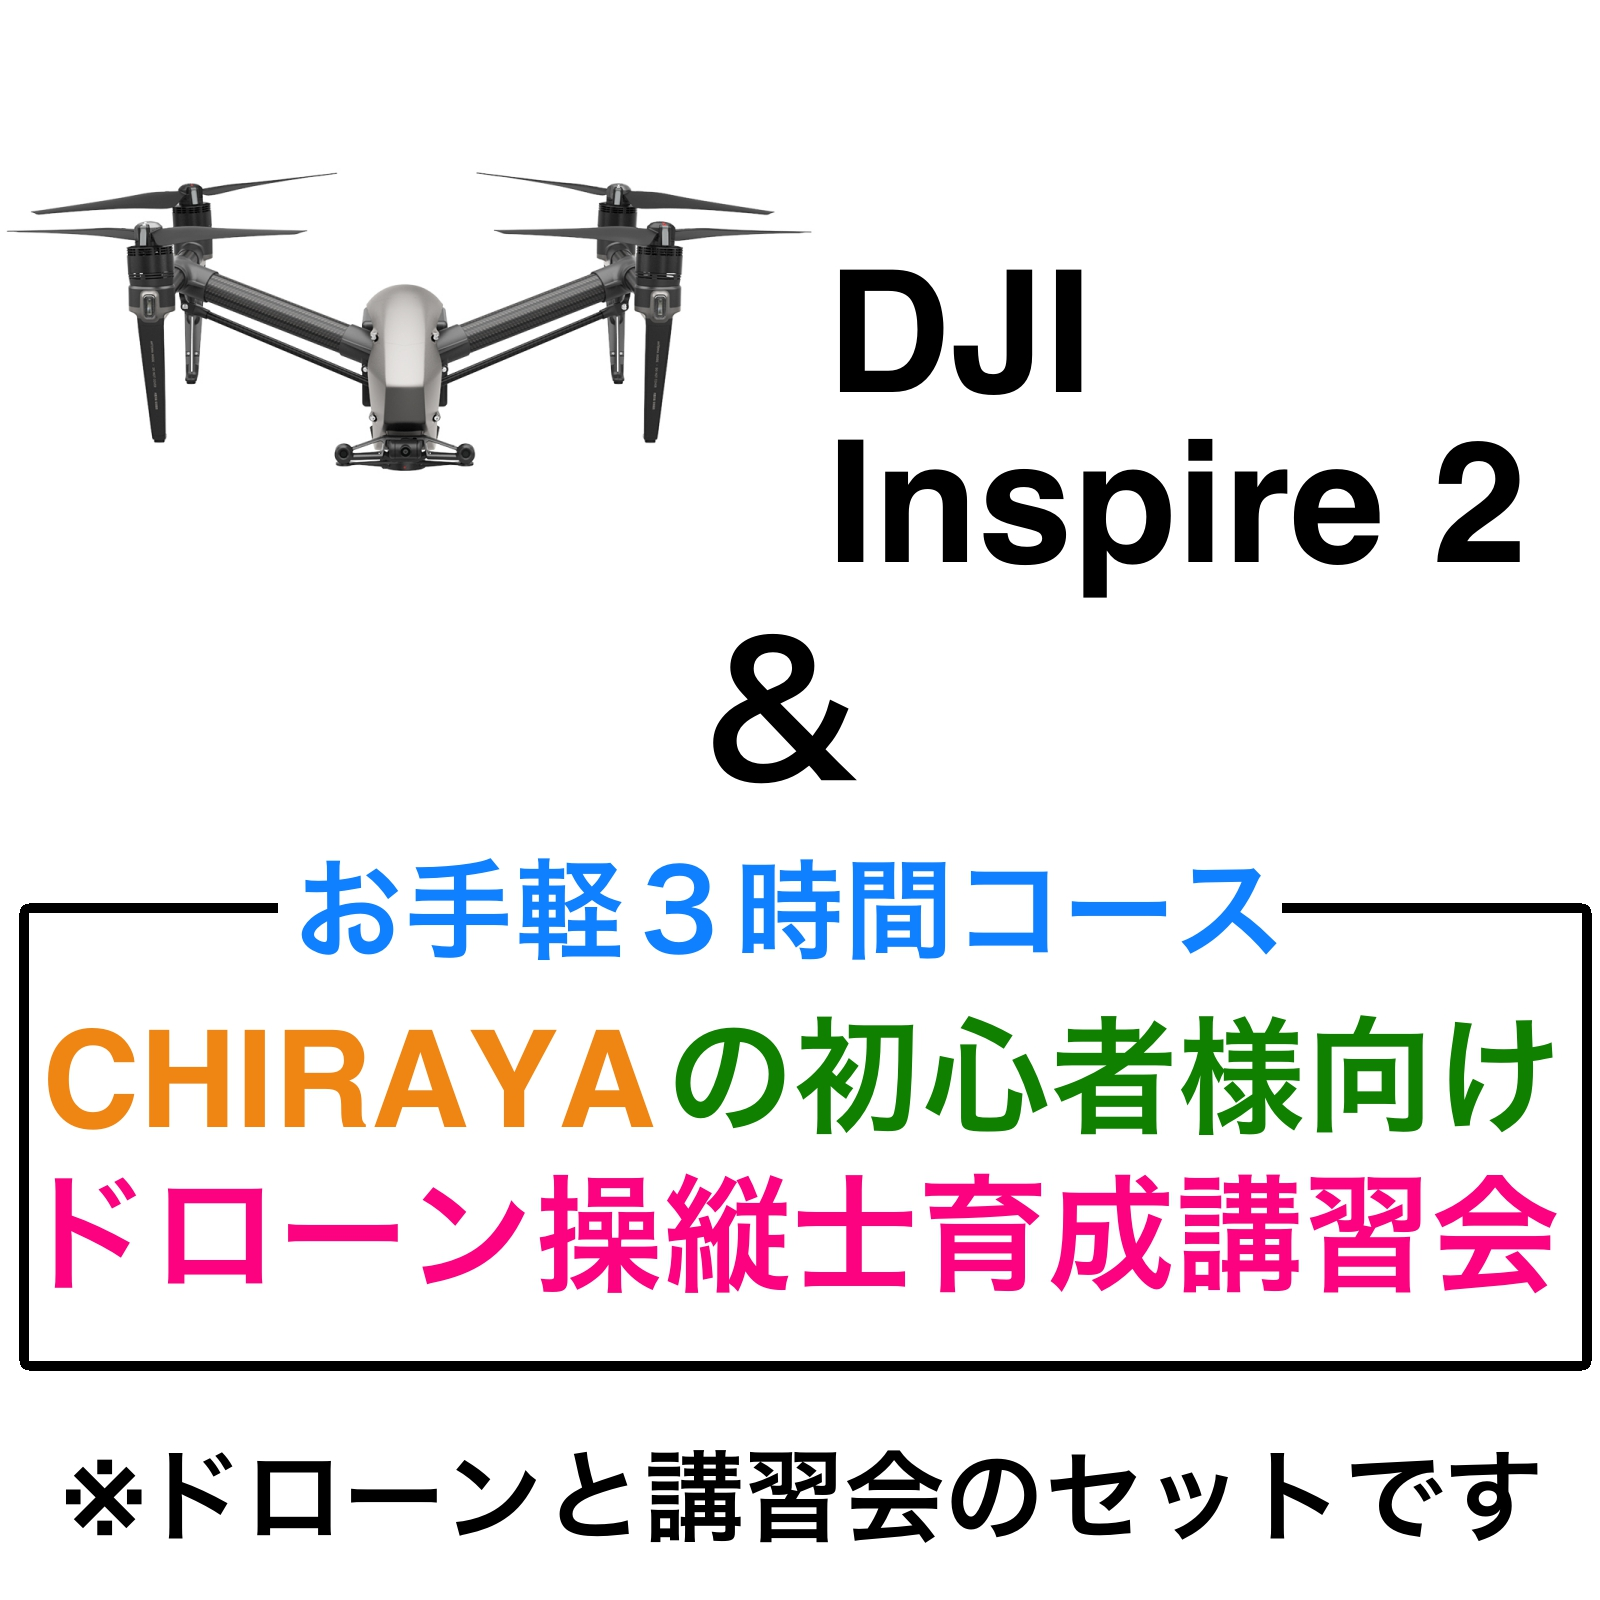 DJI INSPIRE 2+X5S Combo&【個別レッスン 3時間コース】CHRAYAの初心者様向けドローン操縦士育成講習会セット